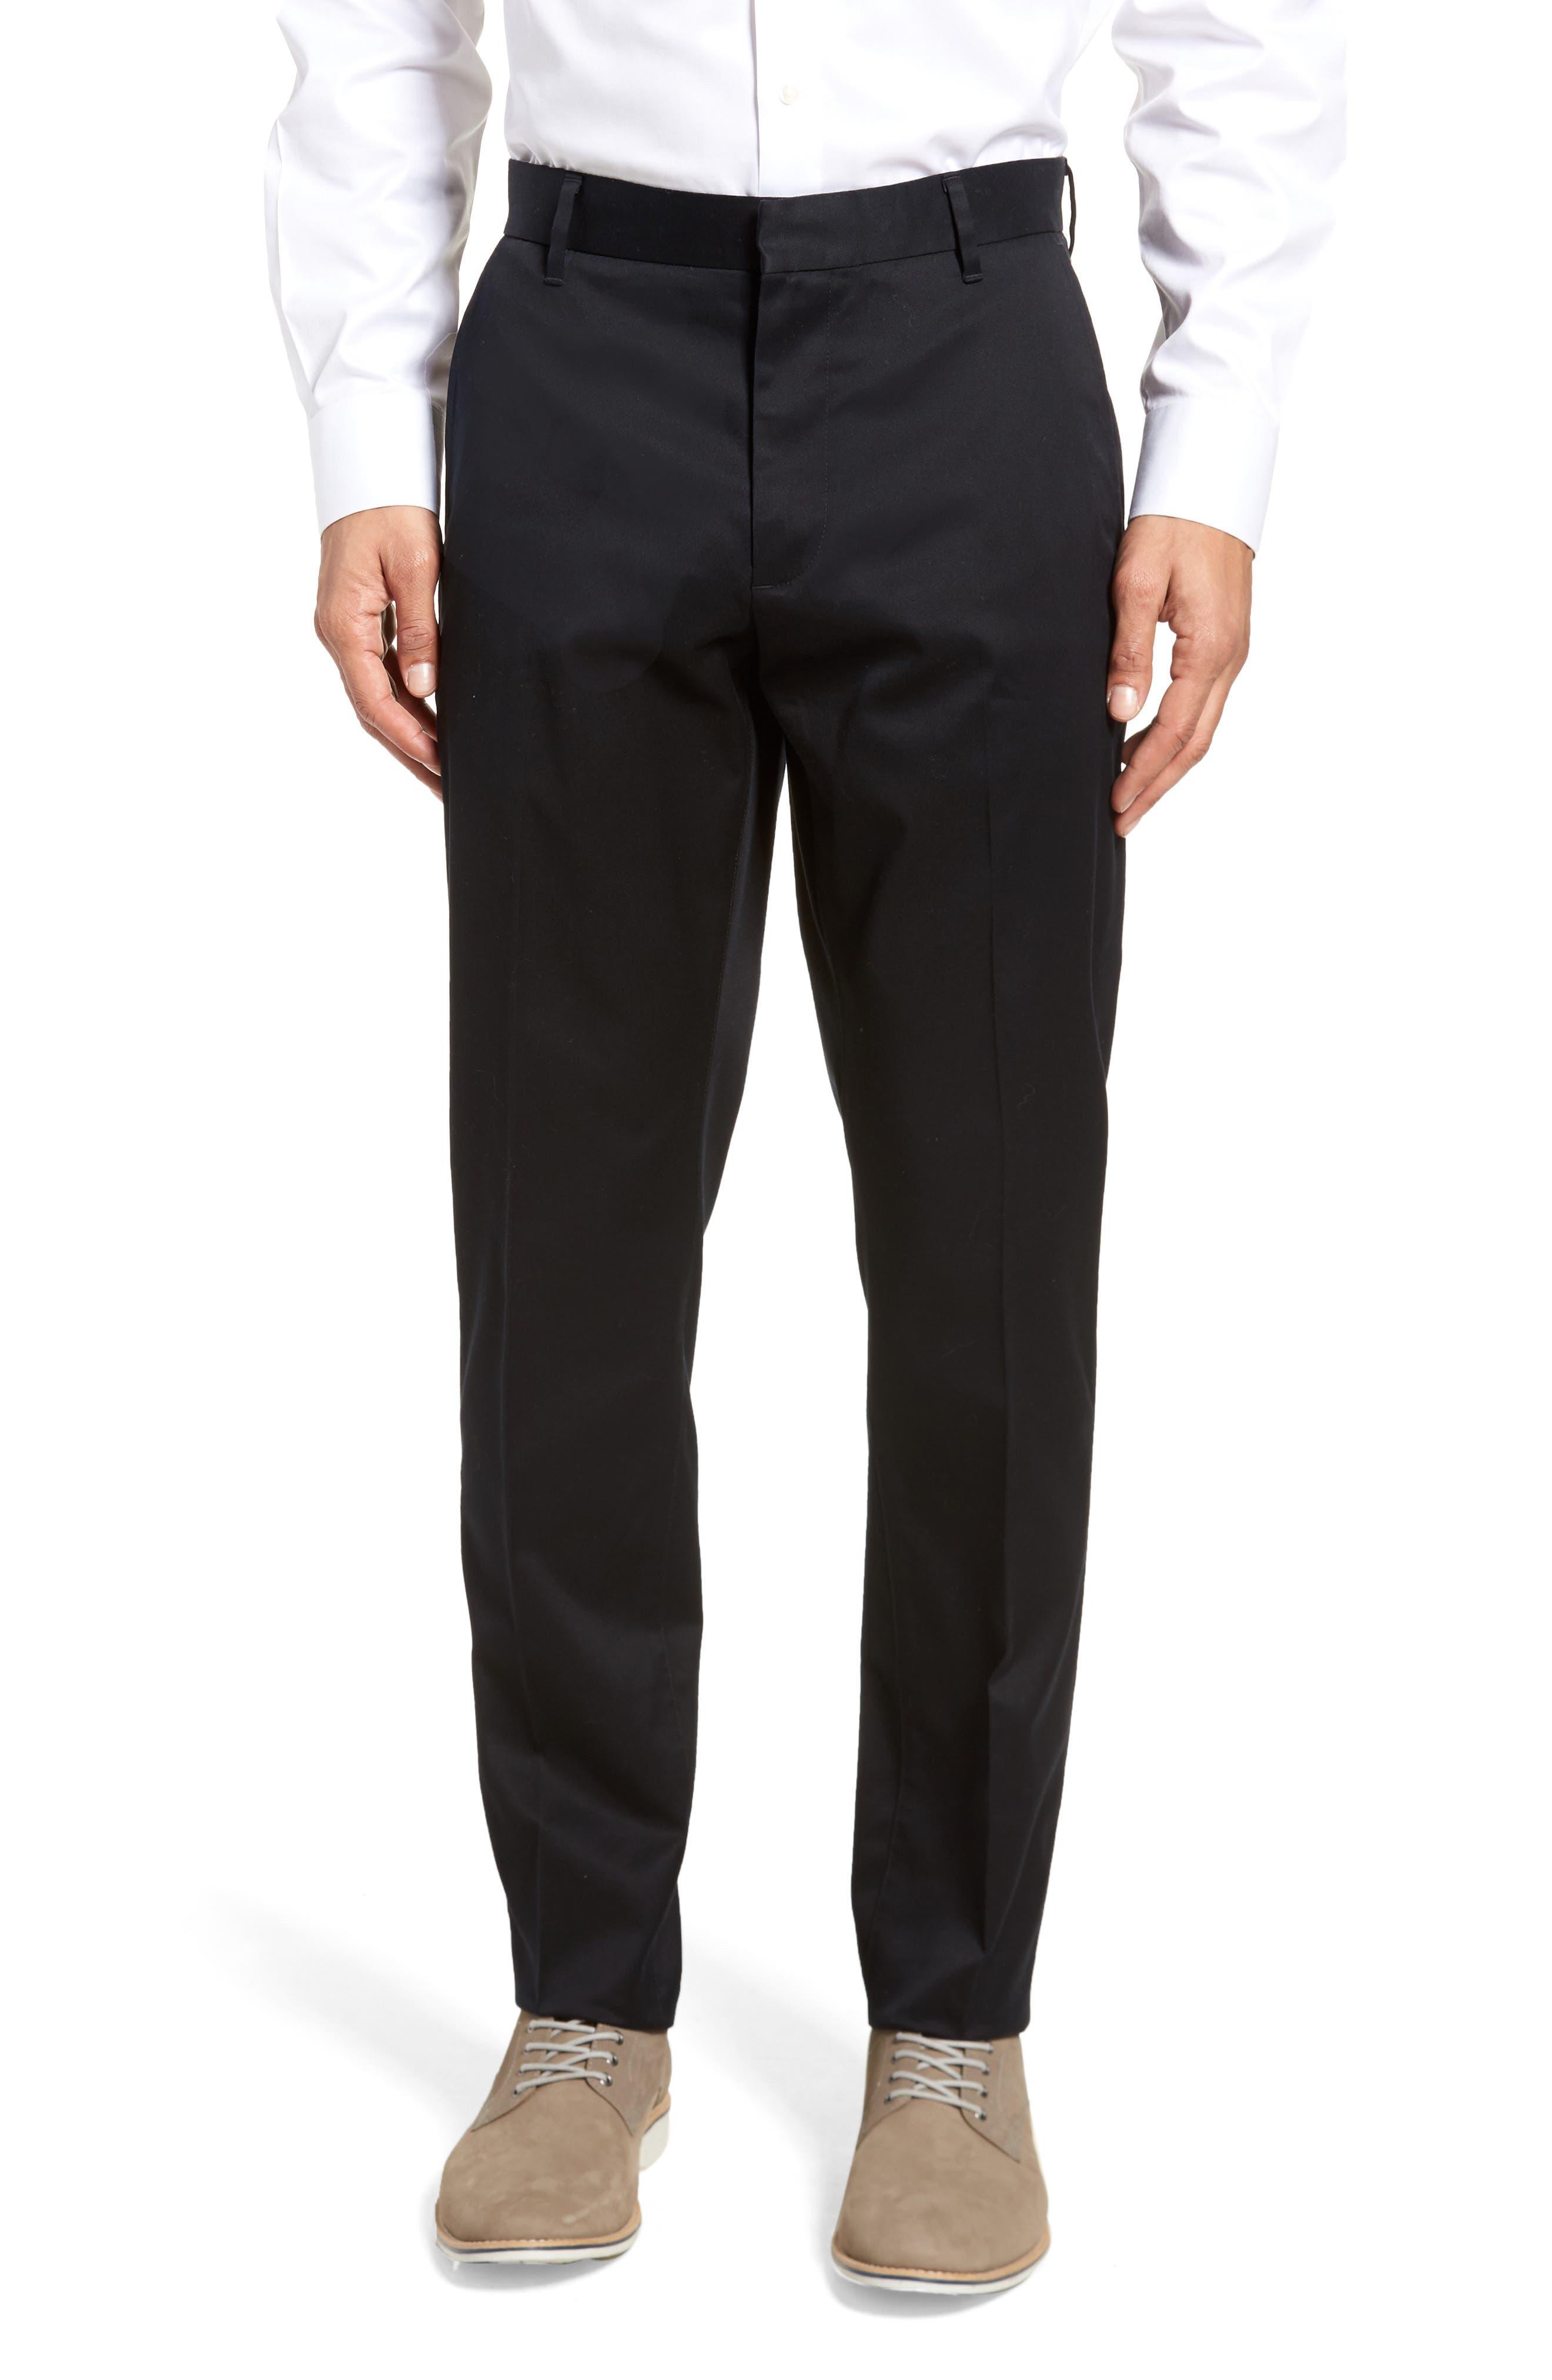 NORDSTROM MEN'S SHOP Athletic Fit Non-Iron Chinos, Main, color, BLACK CAVIAR